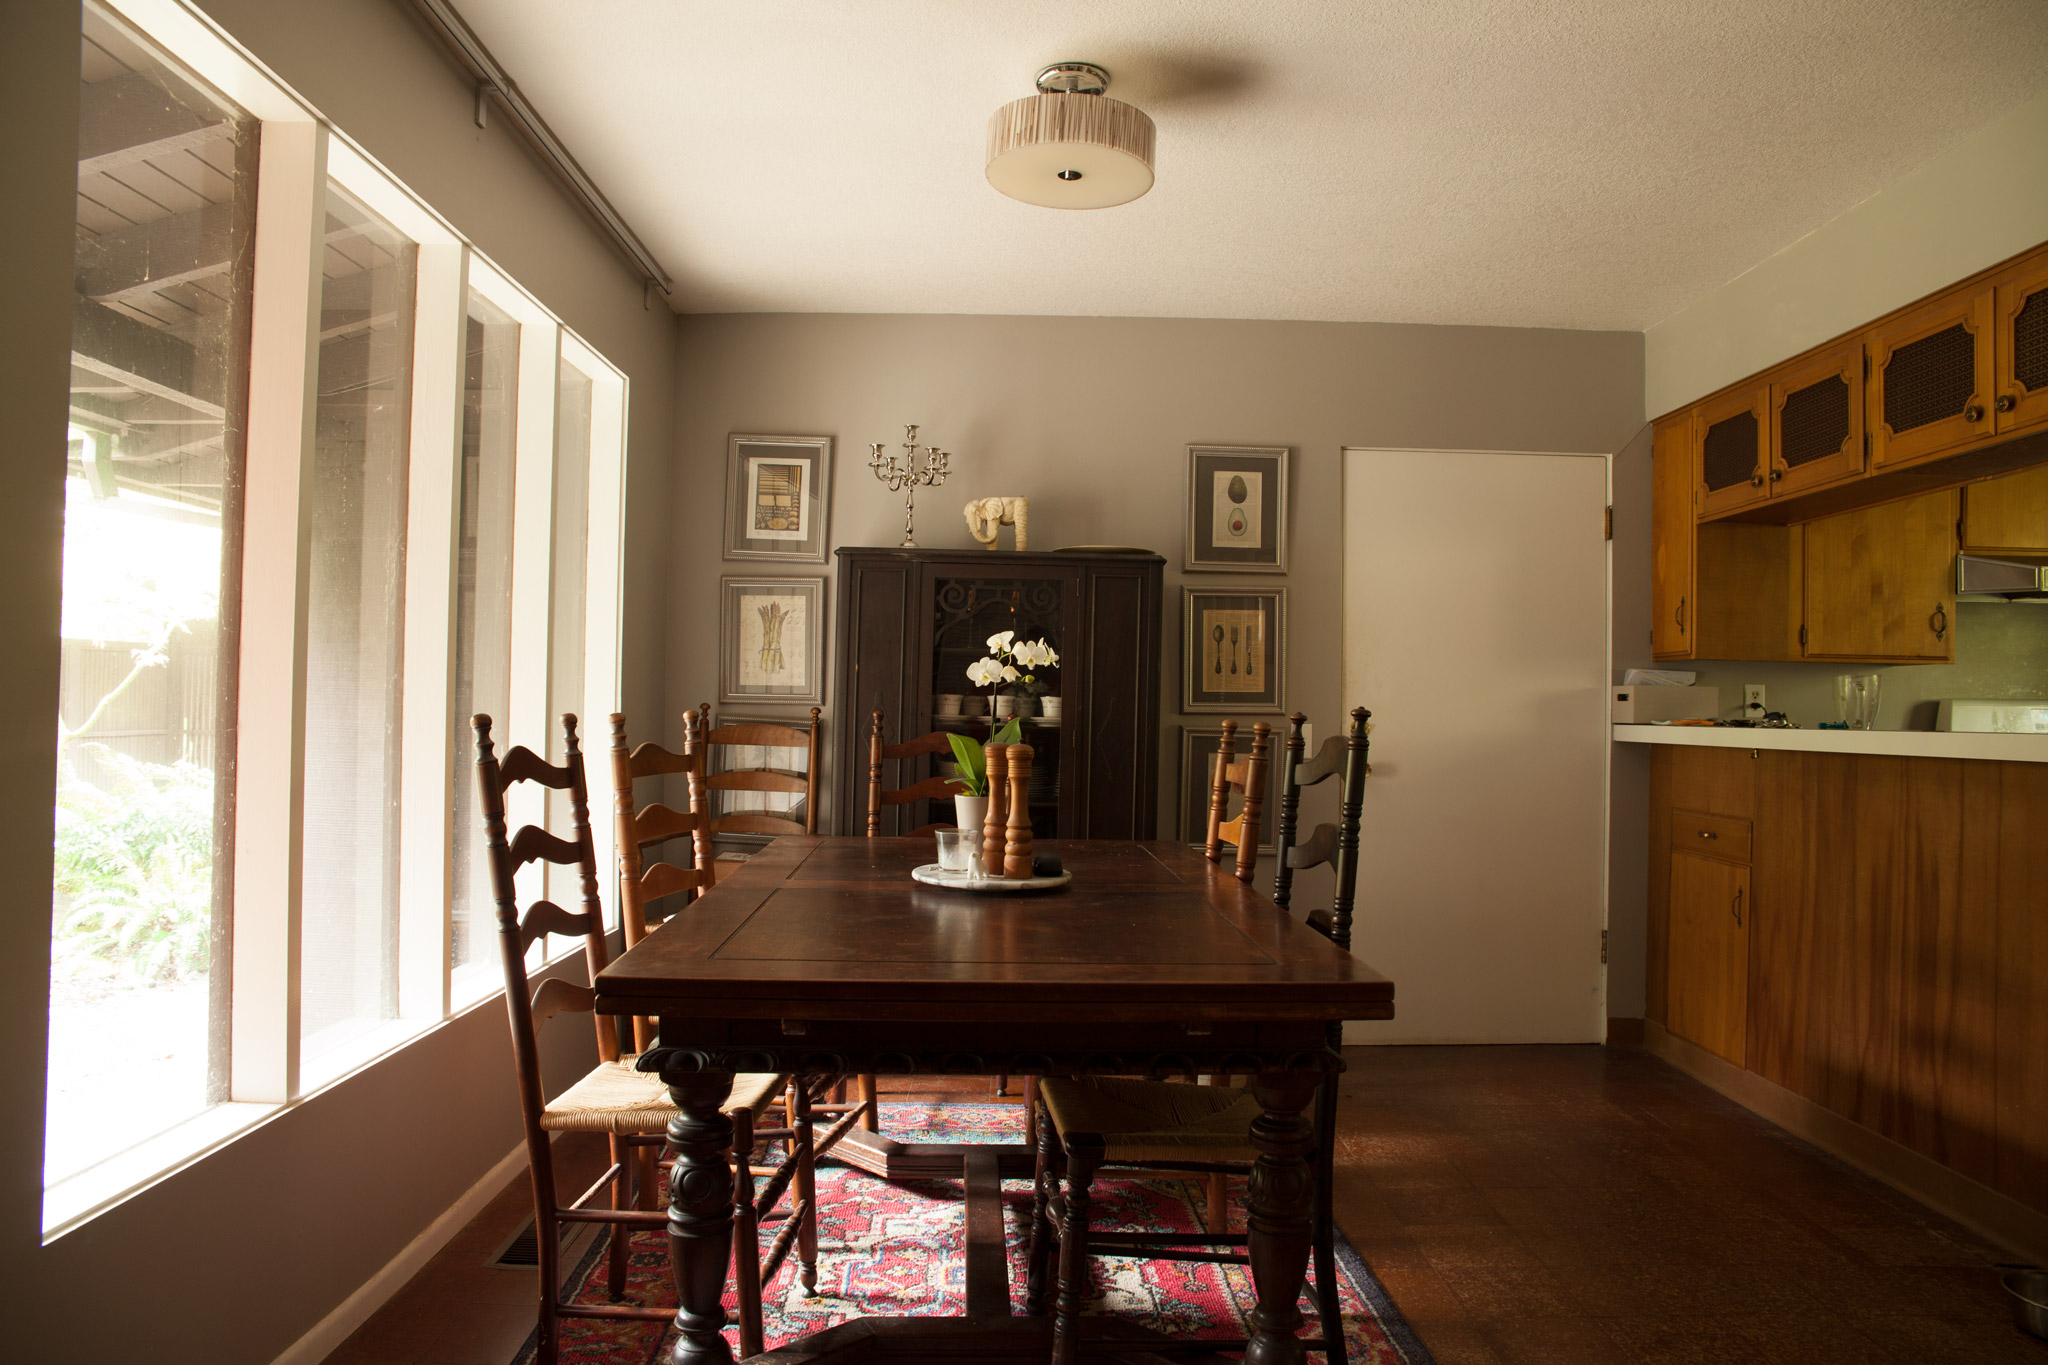 Exhibit B: Dining room before...